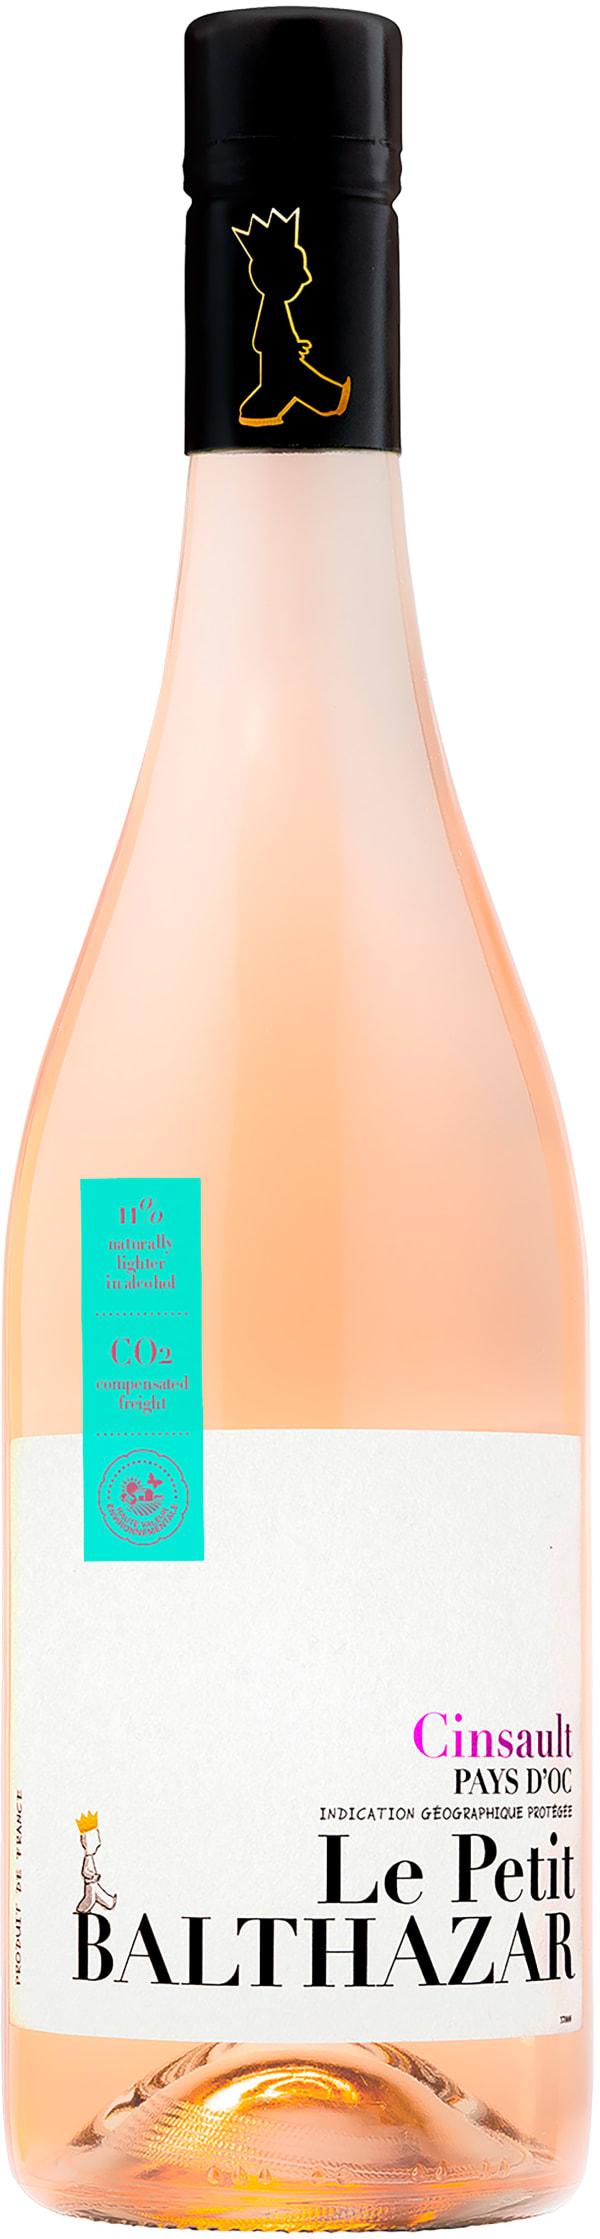 Le Petit Balthazar Cinsault Rosé 2019